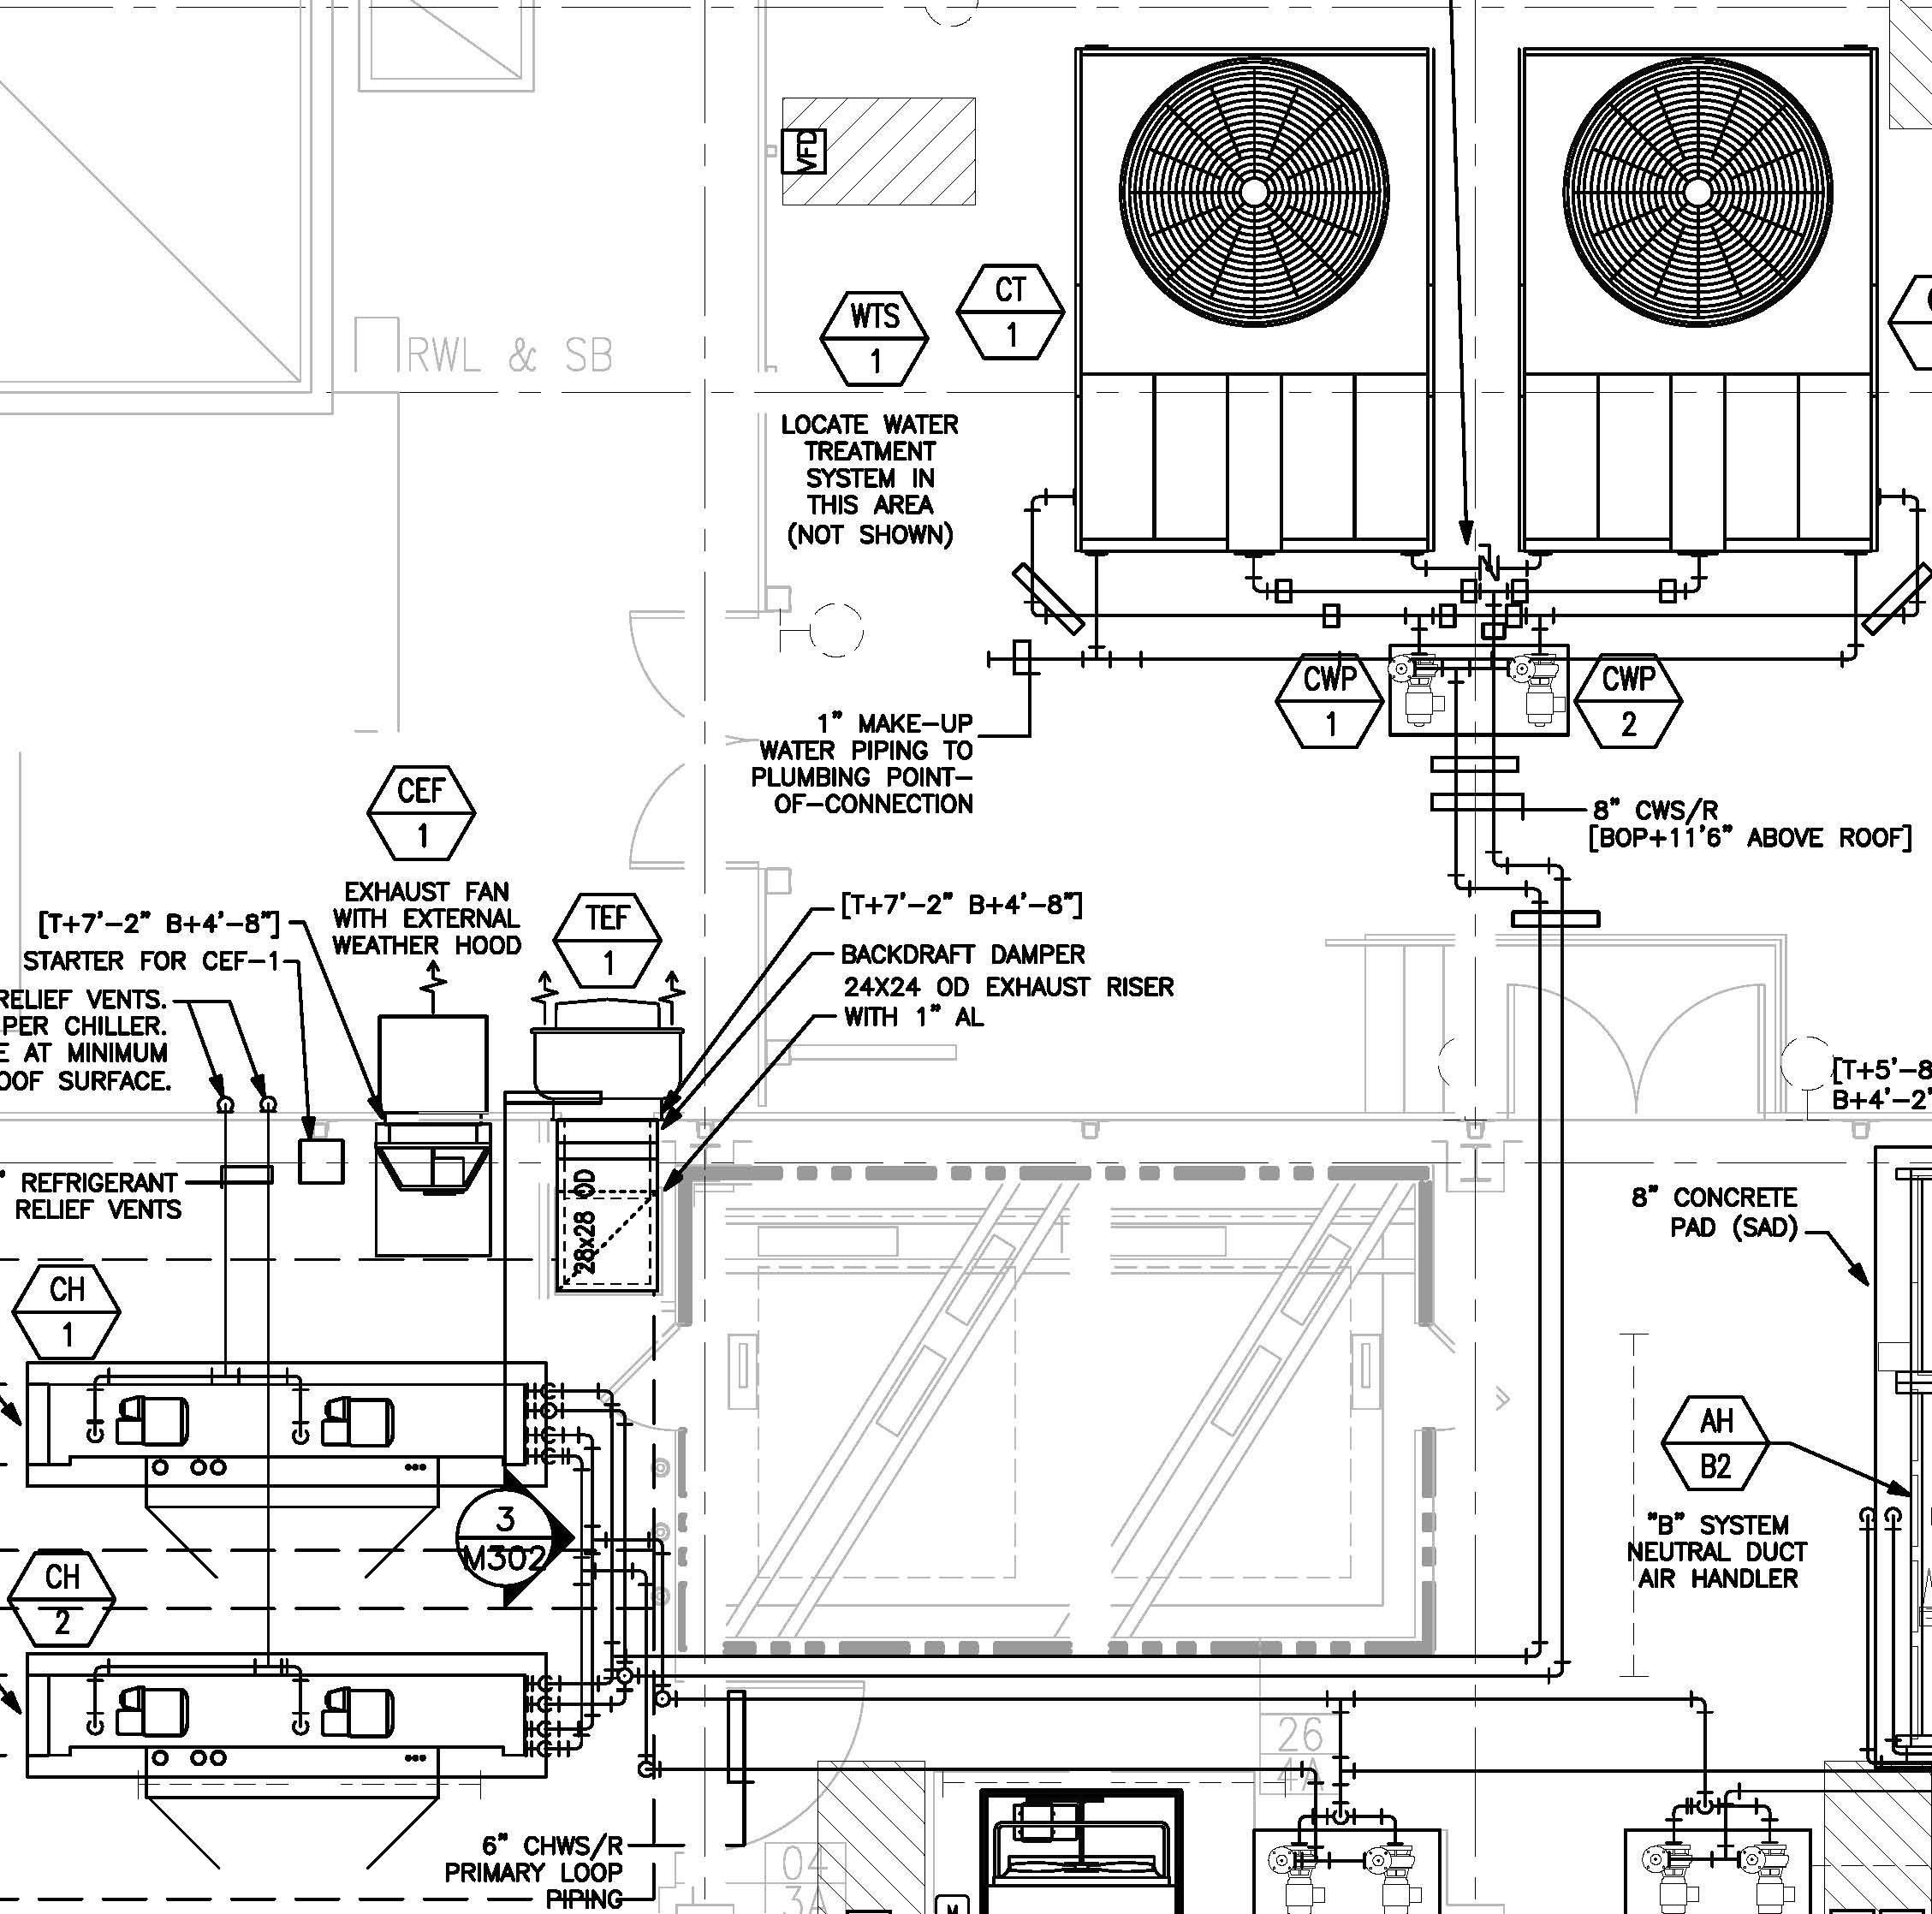 Hvac Condenser Wiring Diagram New Air Conditioning Condensing Unit Wiring Diagram Valid Wiring Diagram